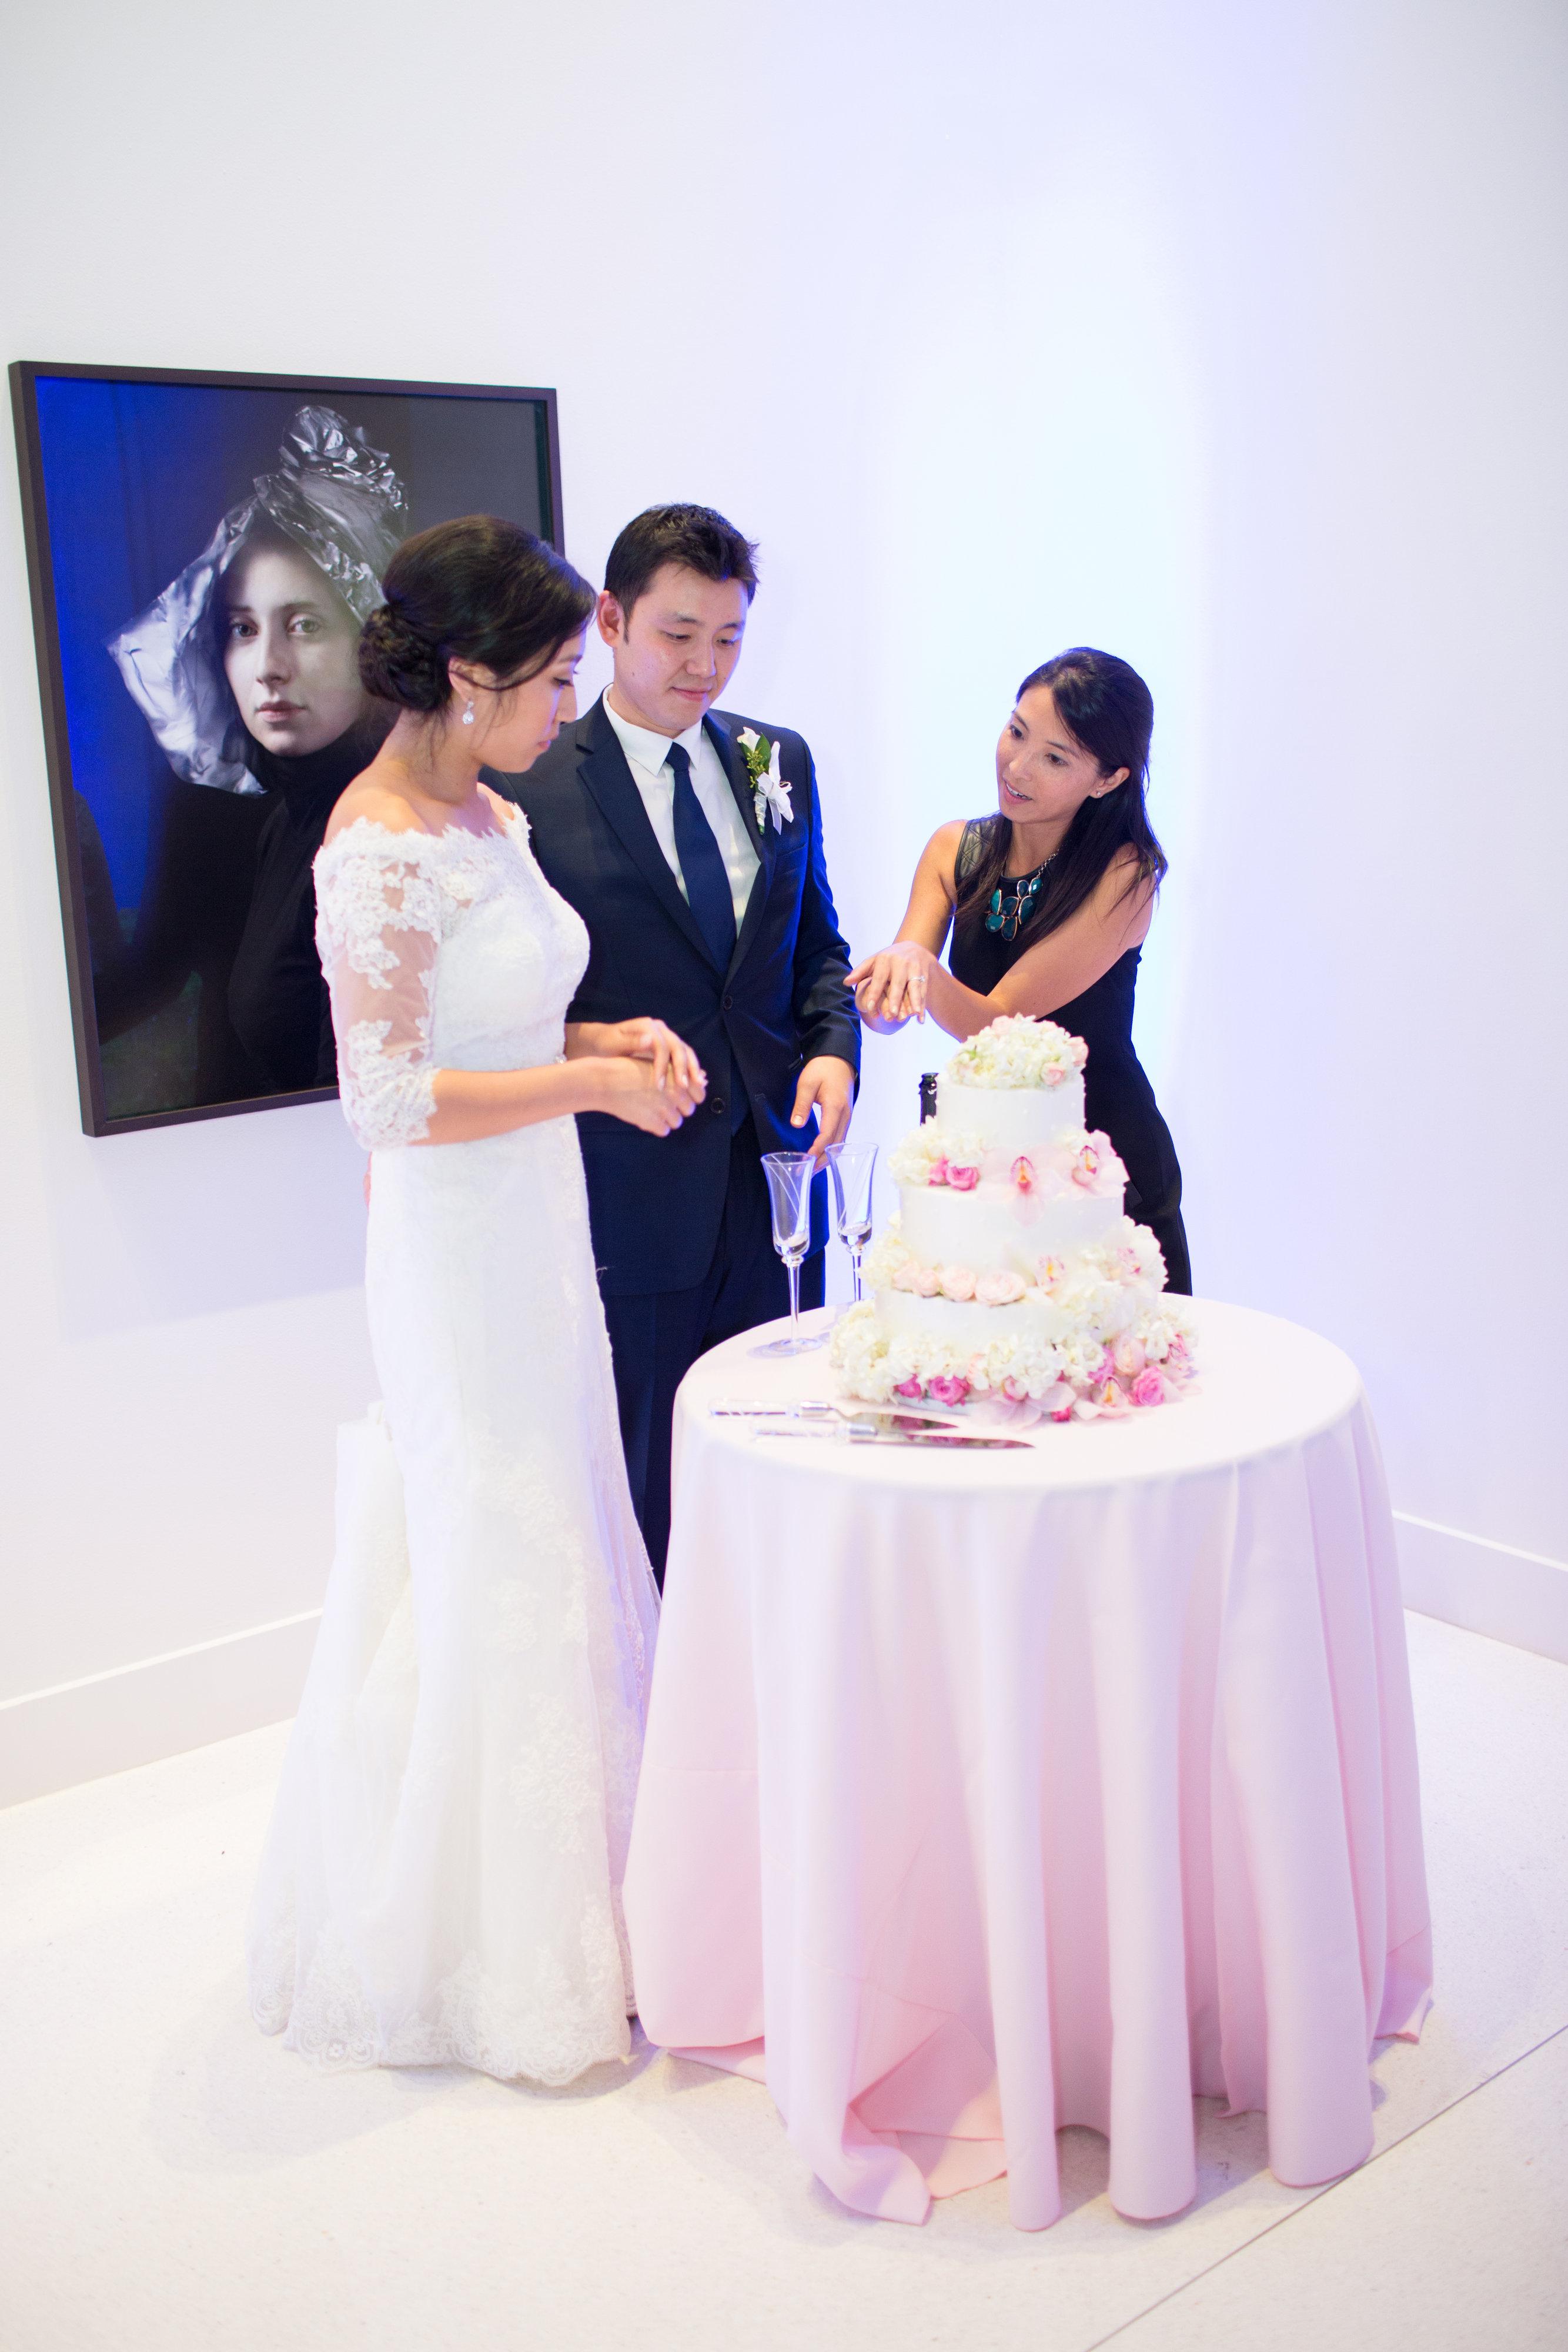 Hire a wedding coordinator